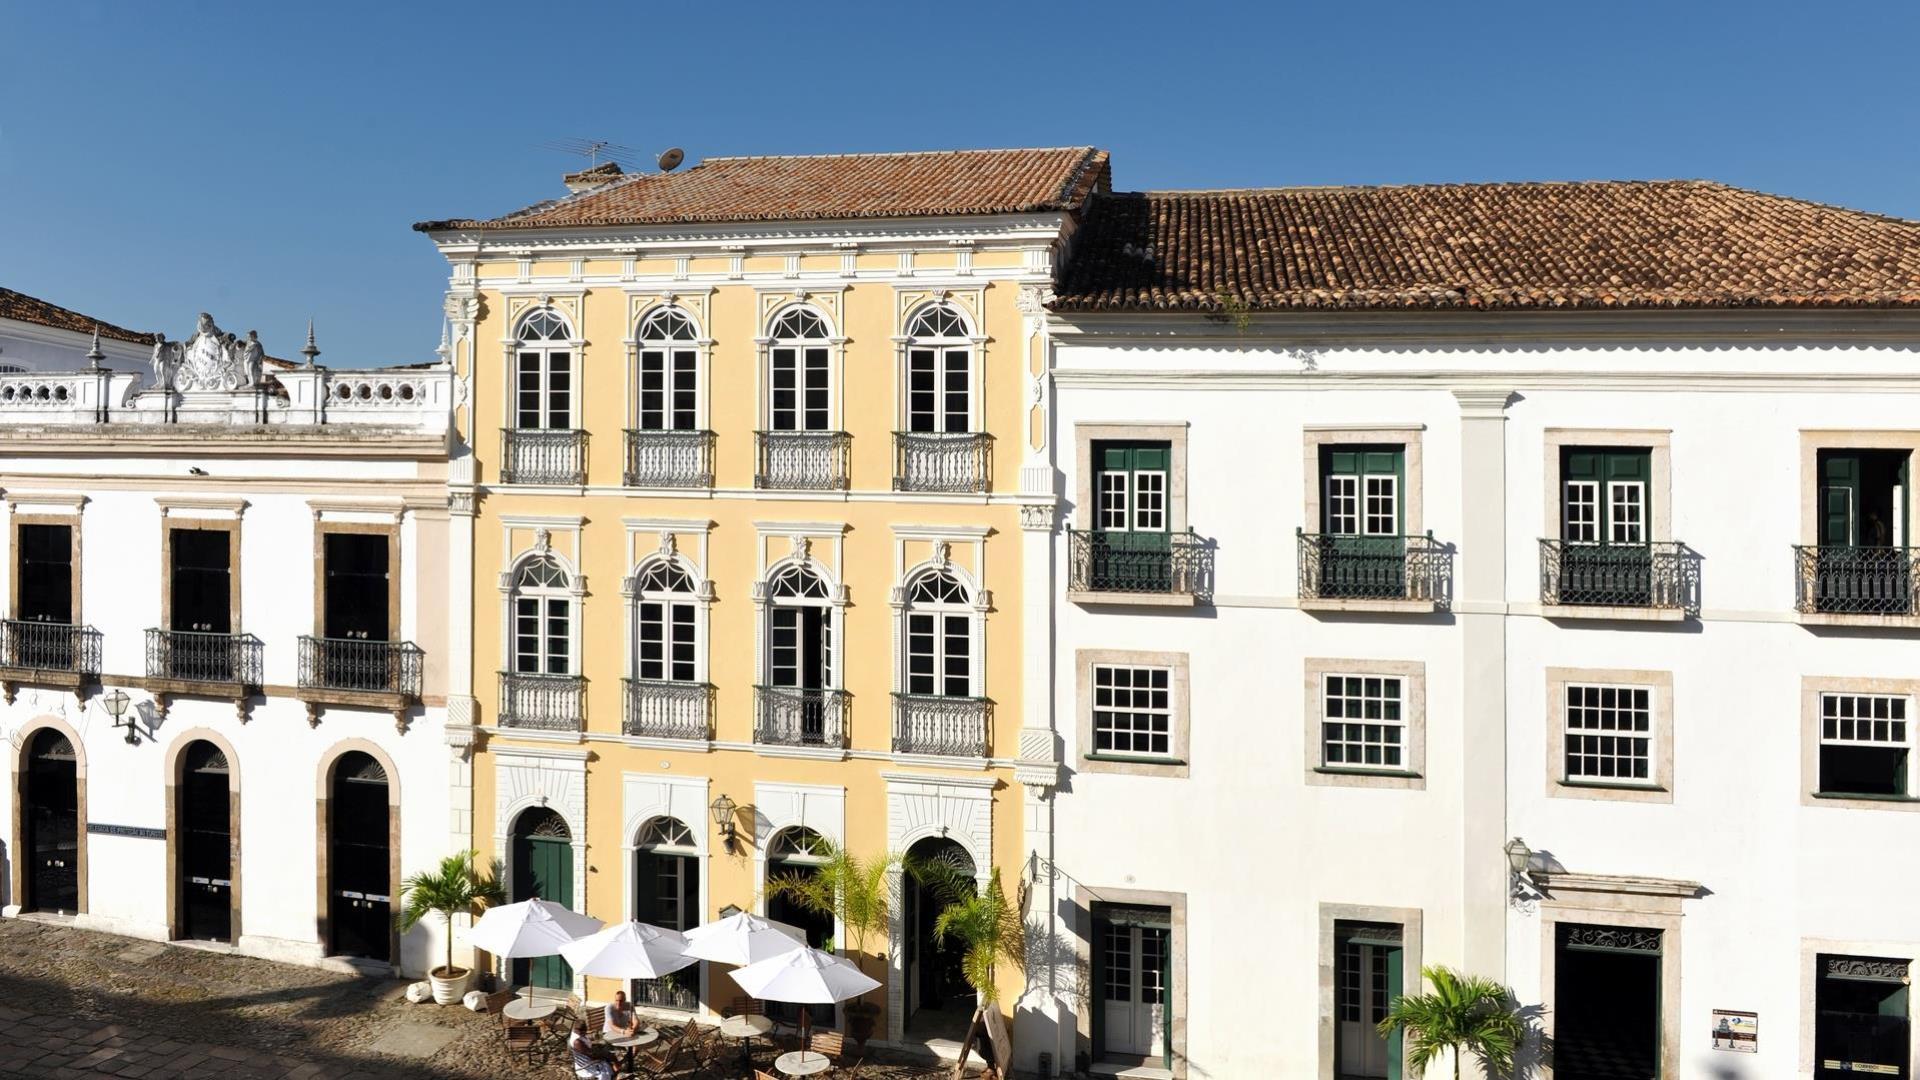 Brasilien salvador hotel villa bahia superior hotel for Superior hotel